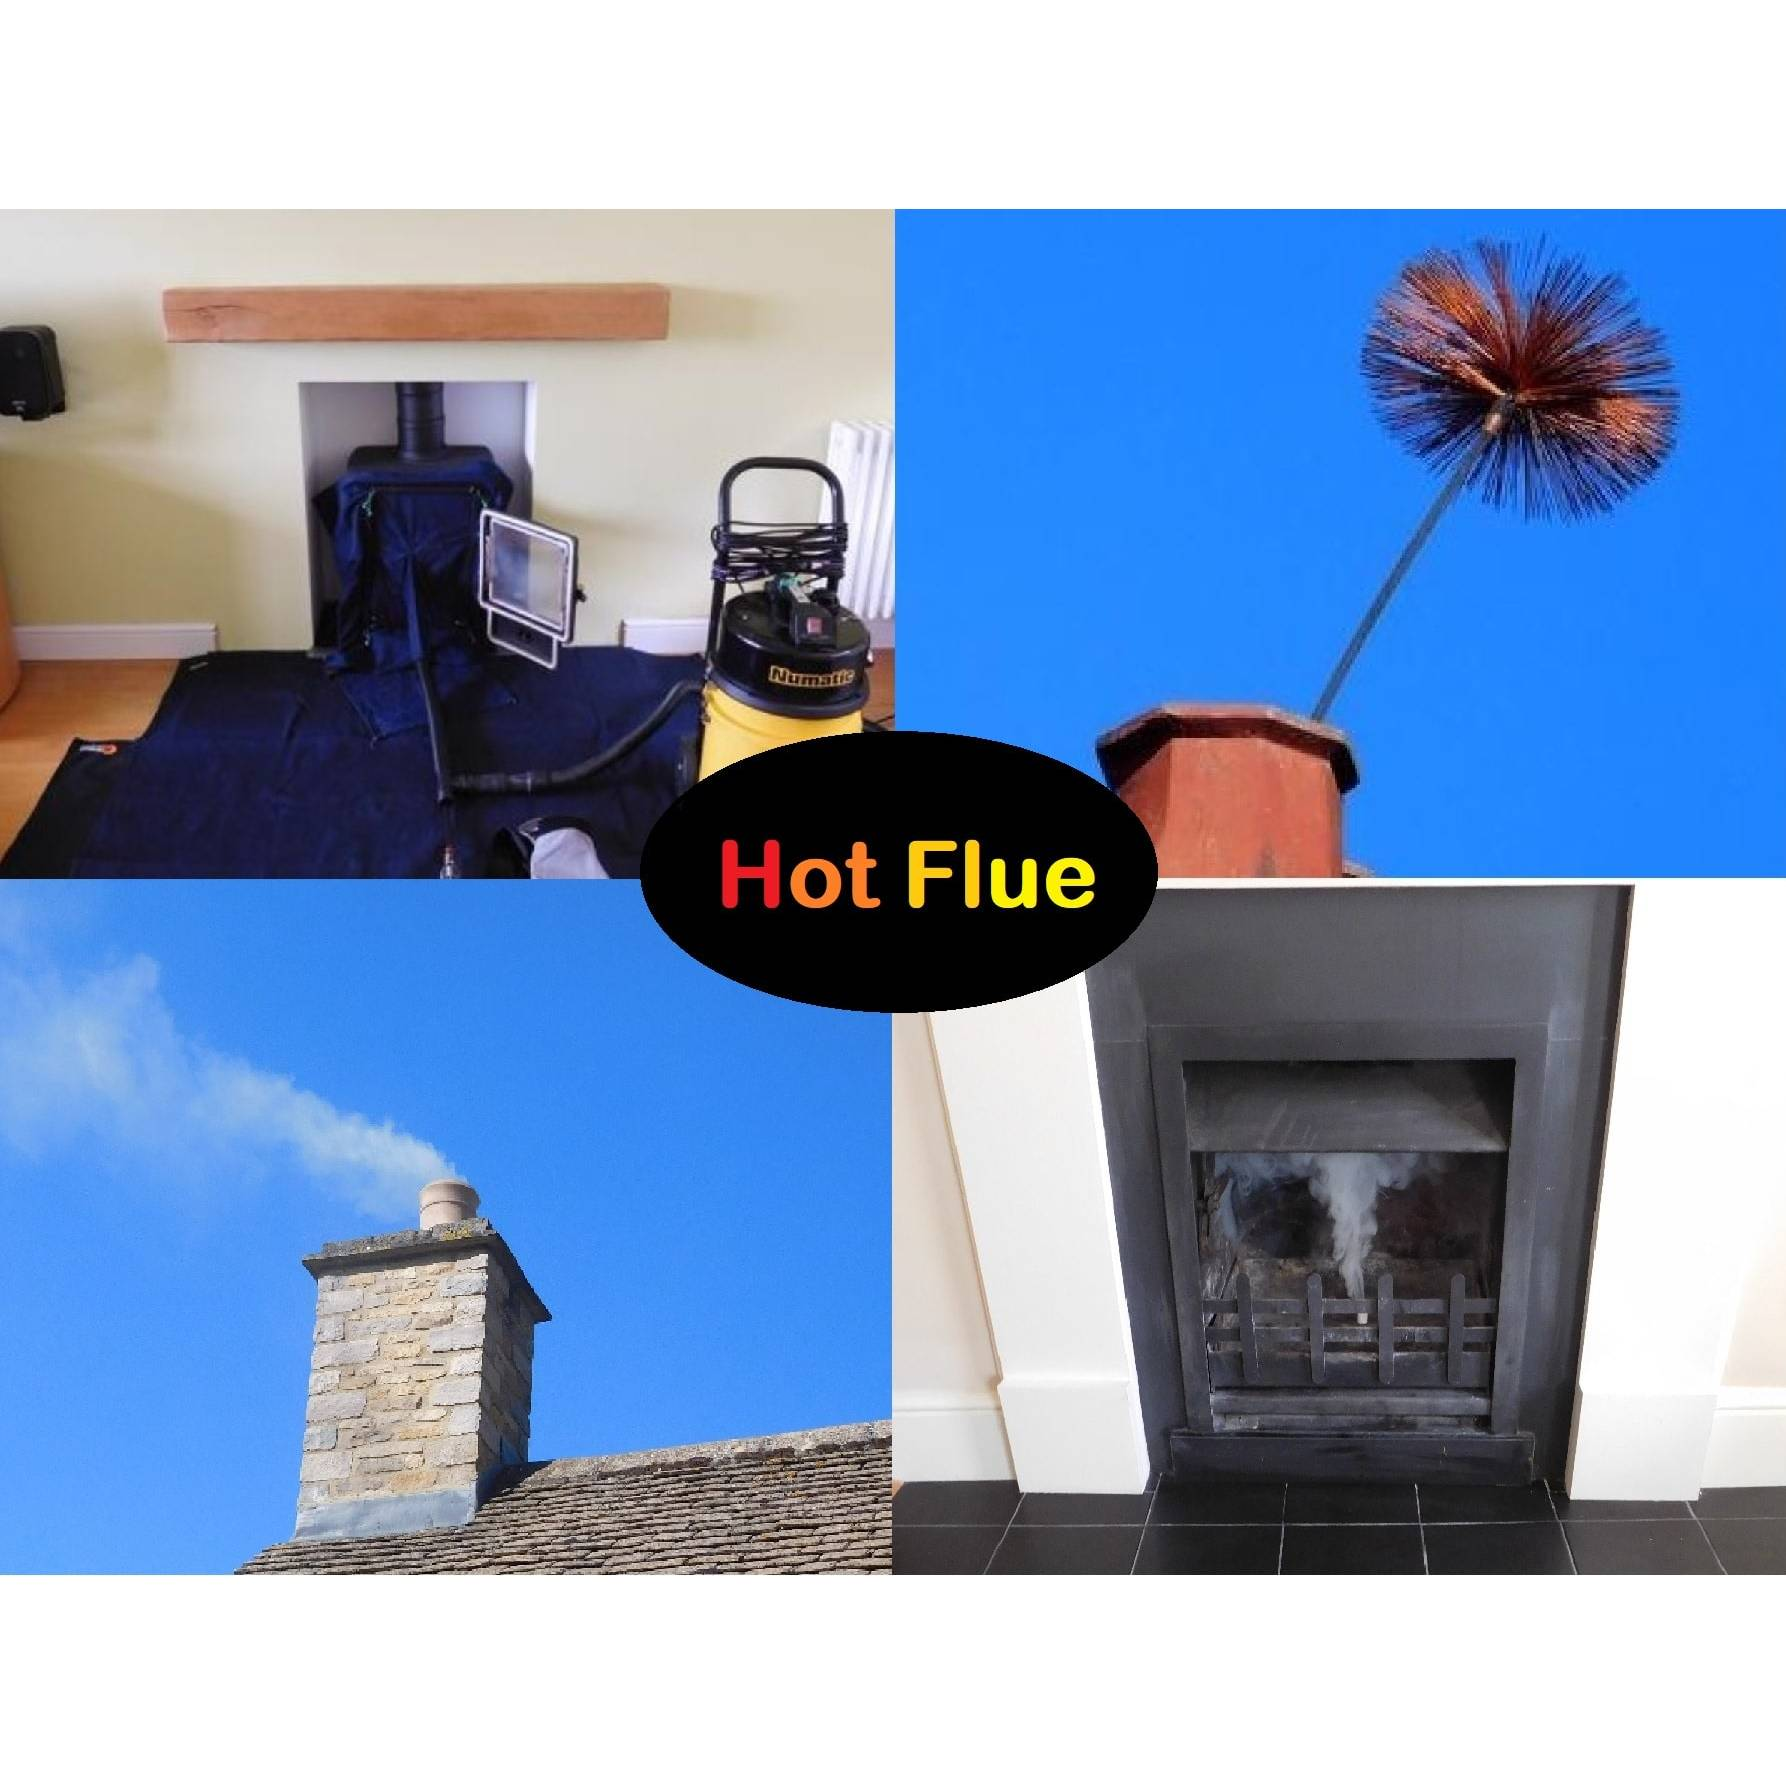 Hot Flue - Bath, Somerset BA1 2FJ - 01225 430589 | ShowMeLocal.com